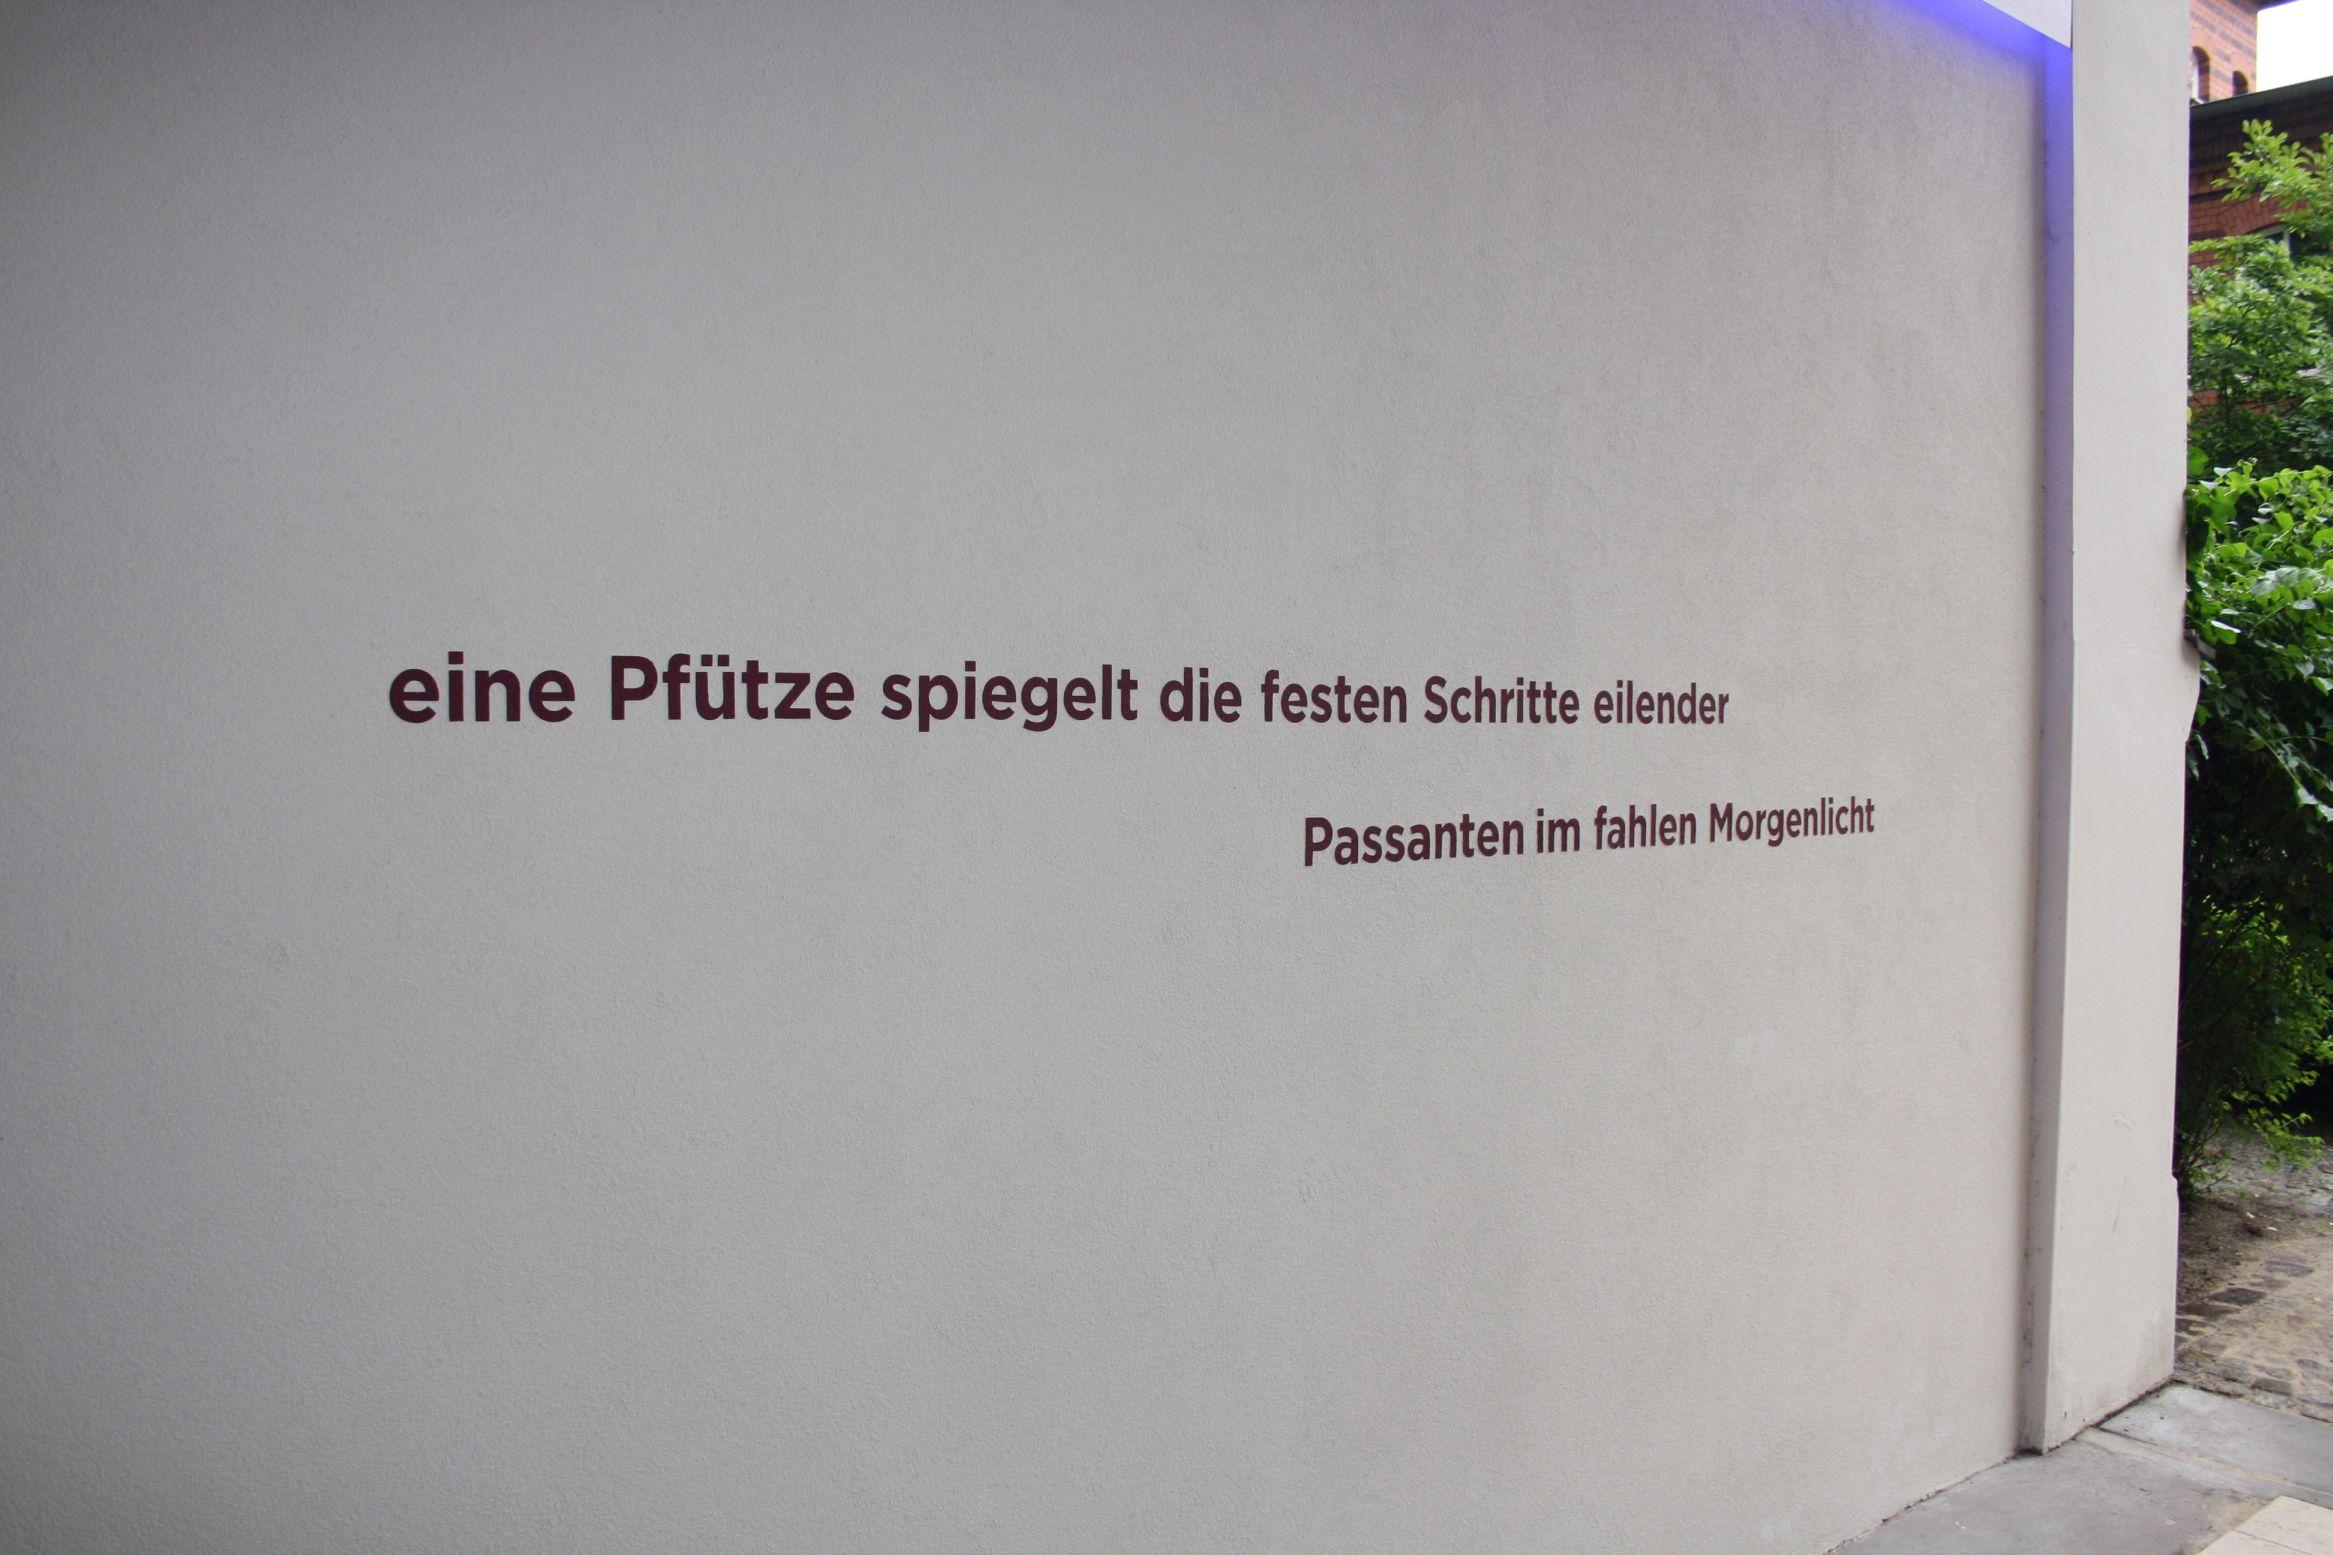 gelungene-premiere-vom-berliner-city-race-sightseeing-mit-ol-karte-1.jpg